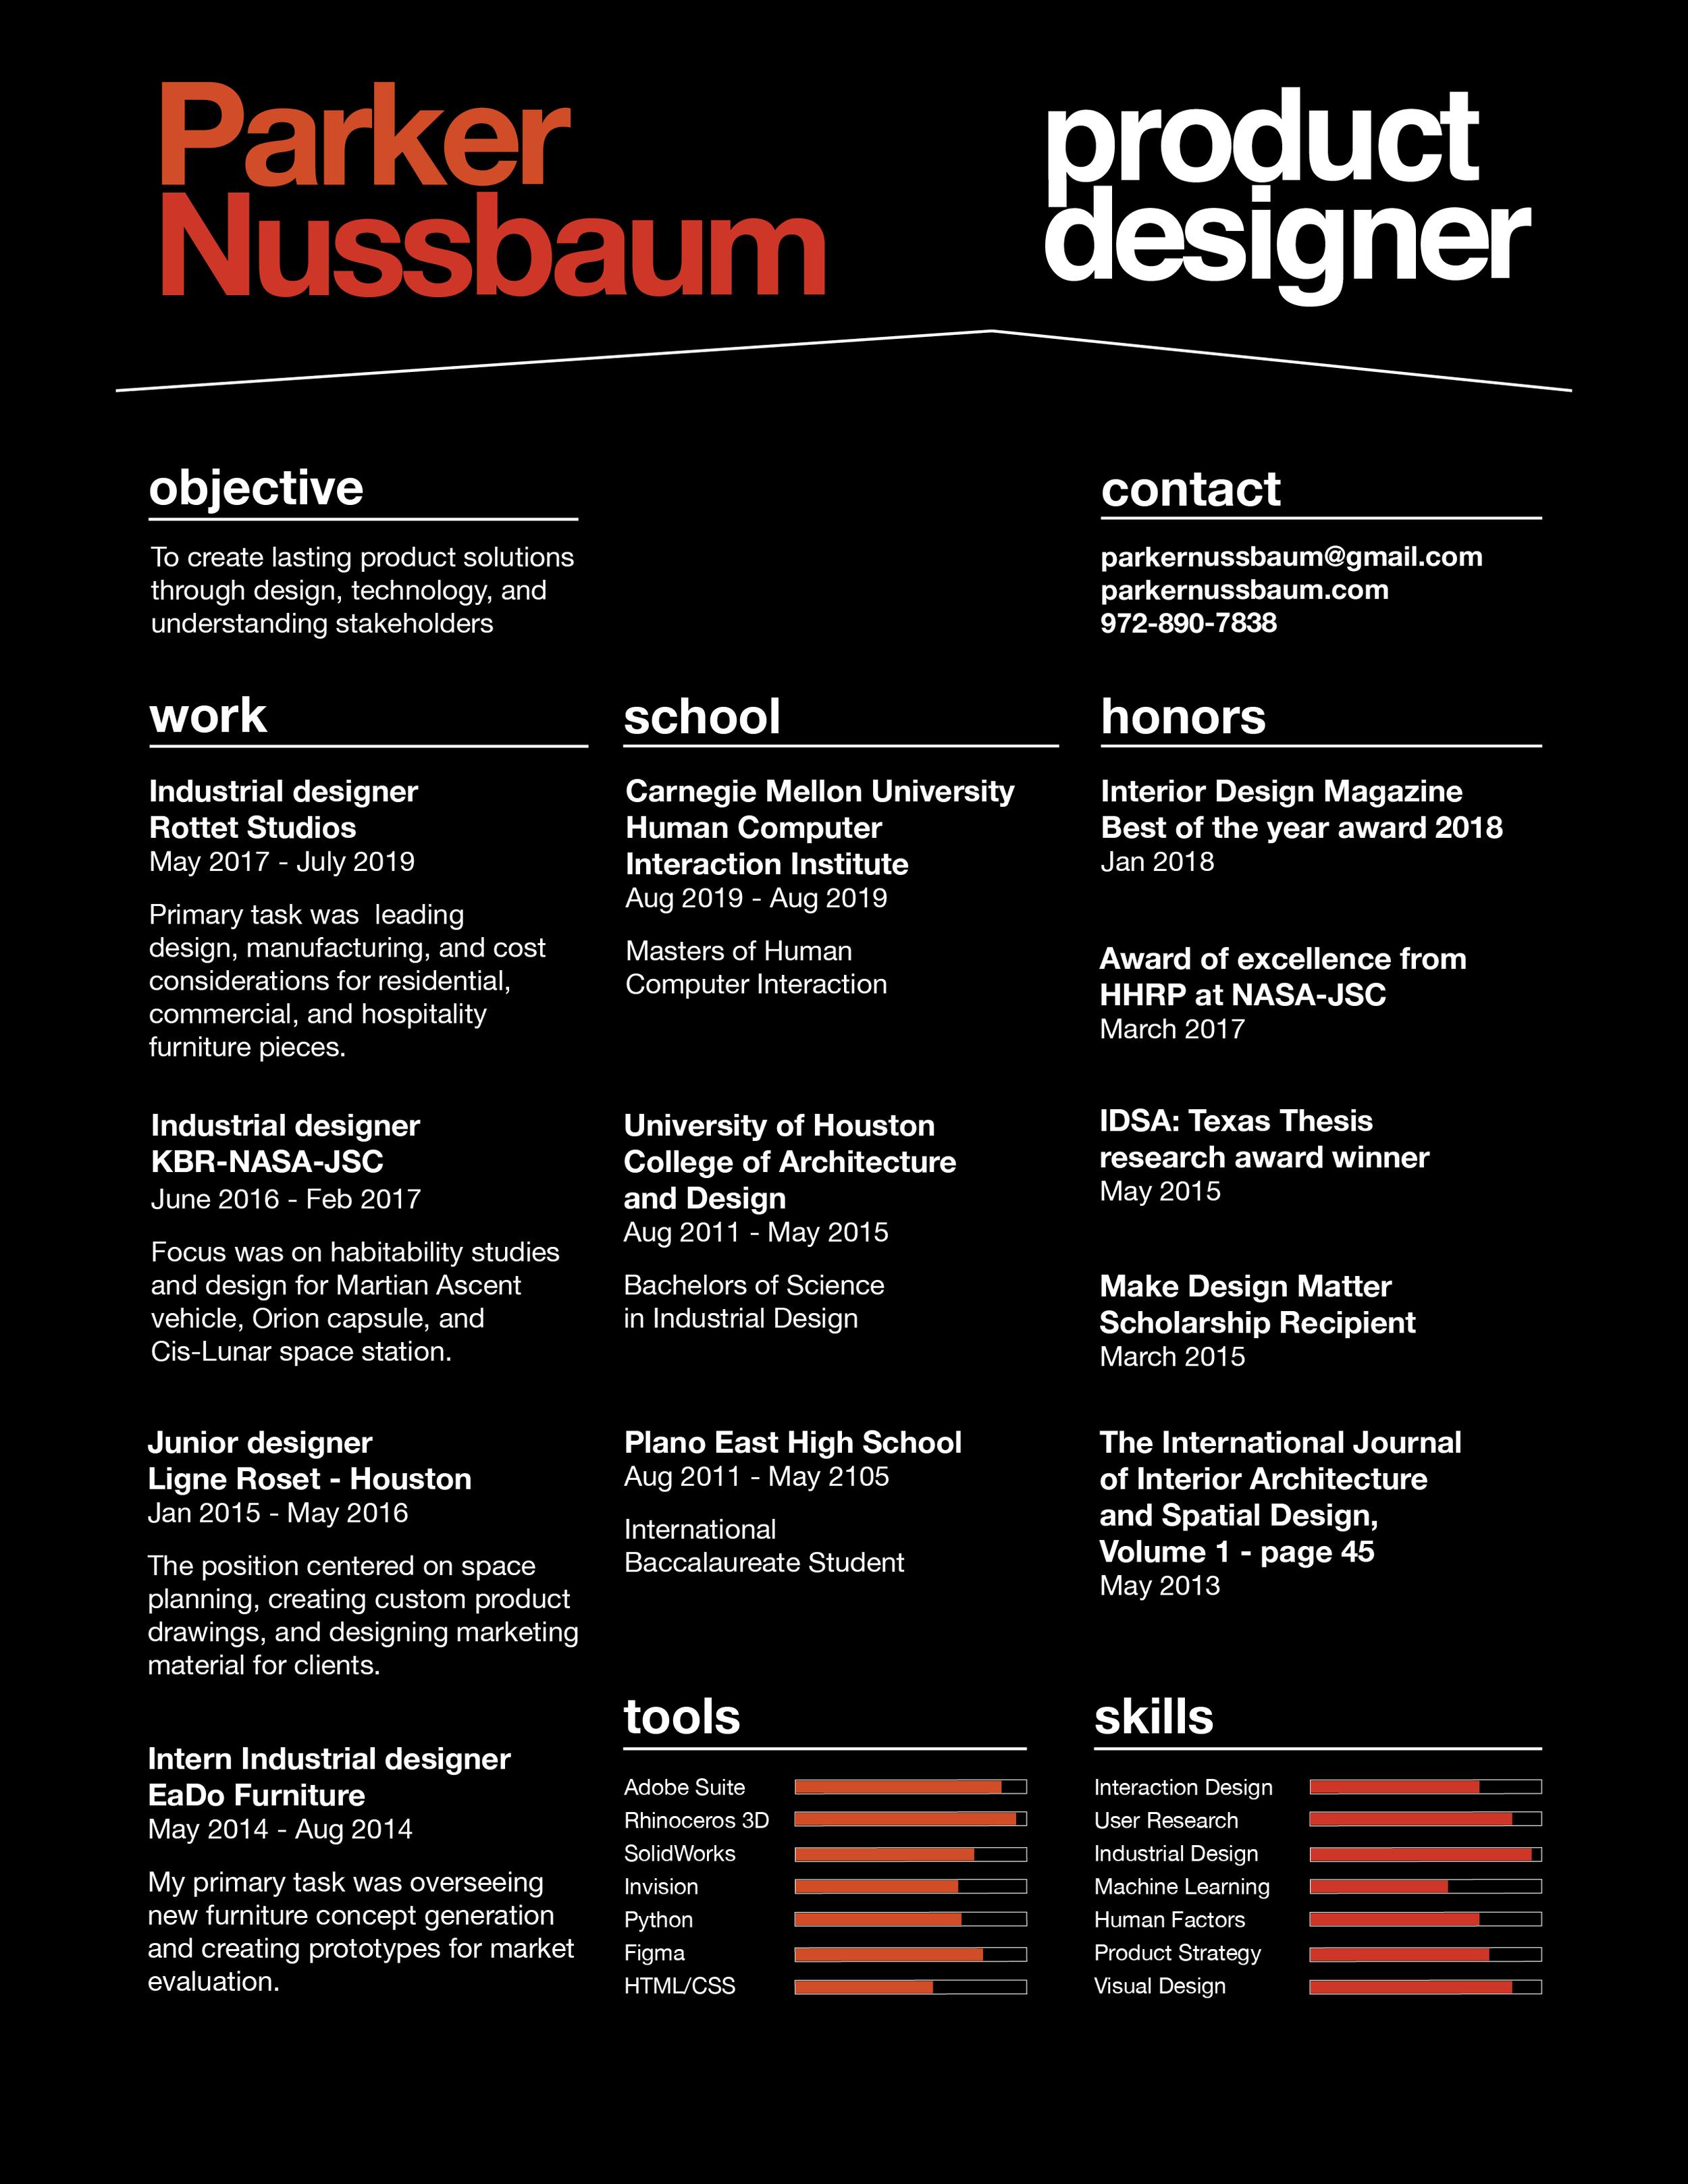 Parker Nussbaum Resume 9_12_19.png